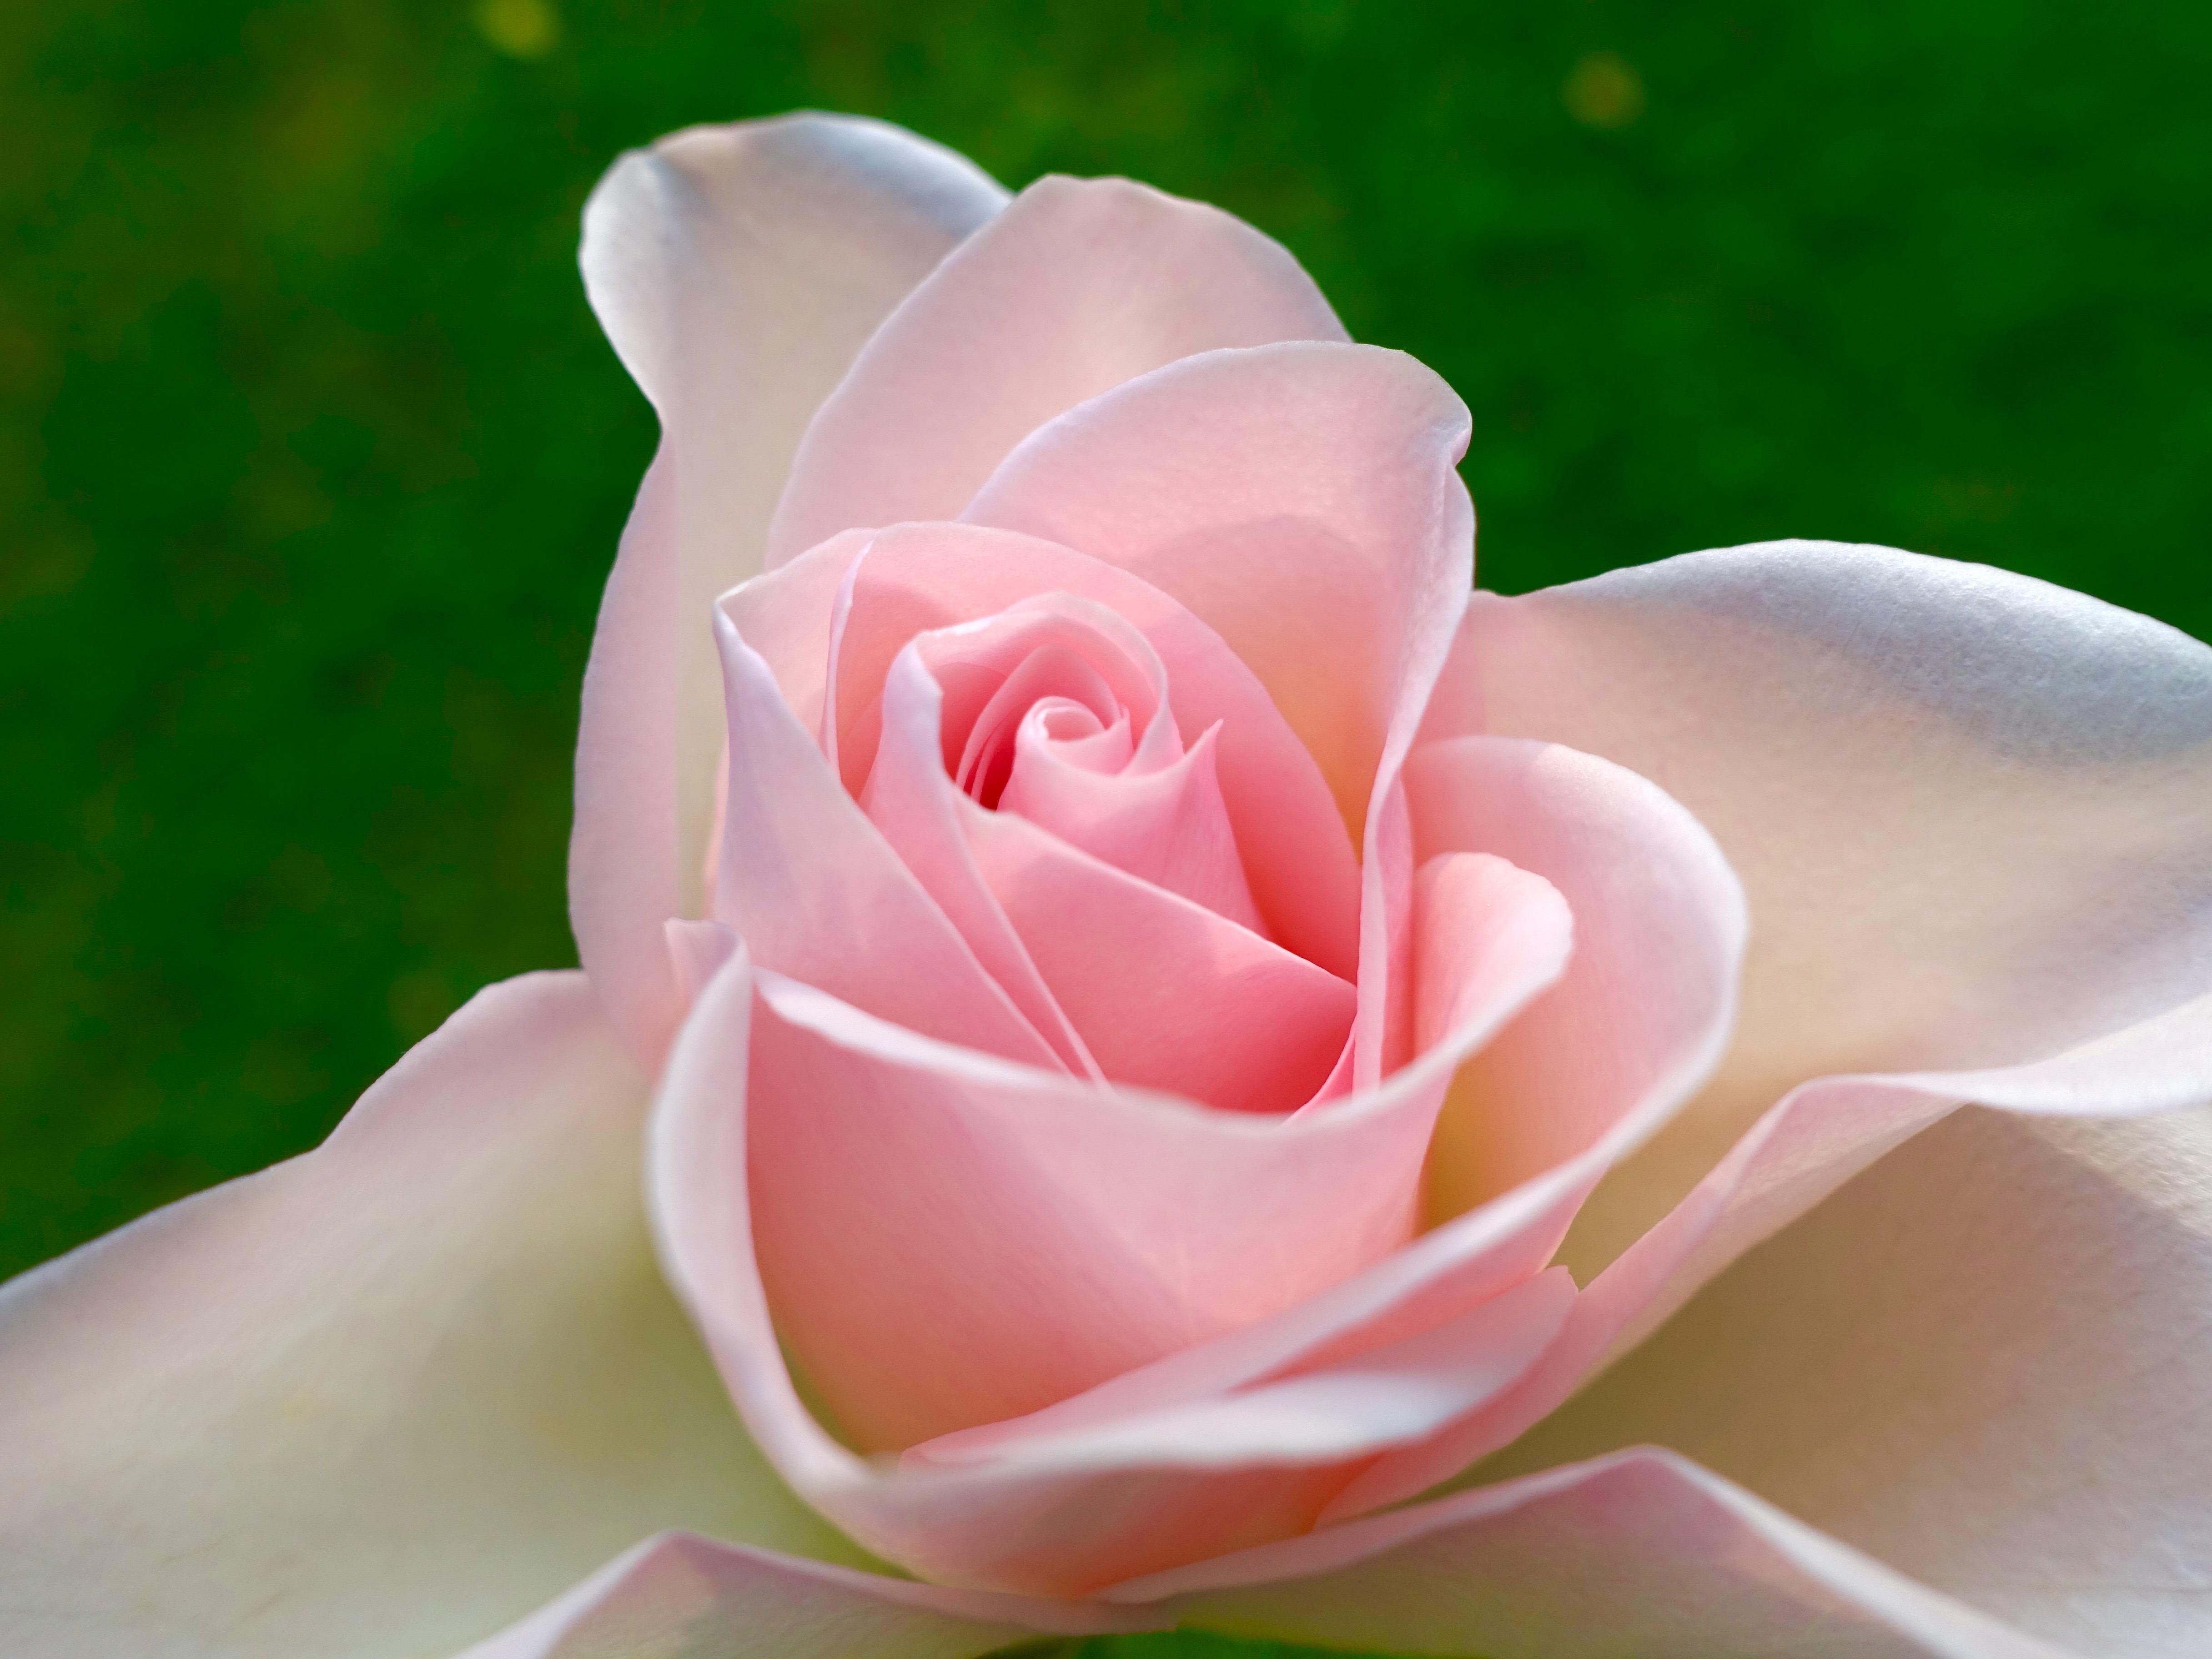 pink rose © KIM JONKER